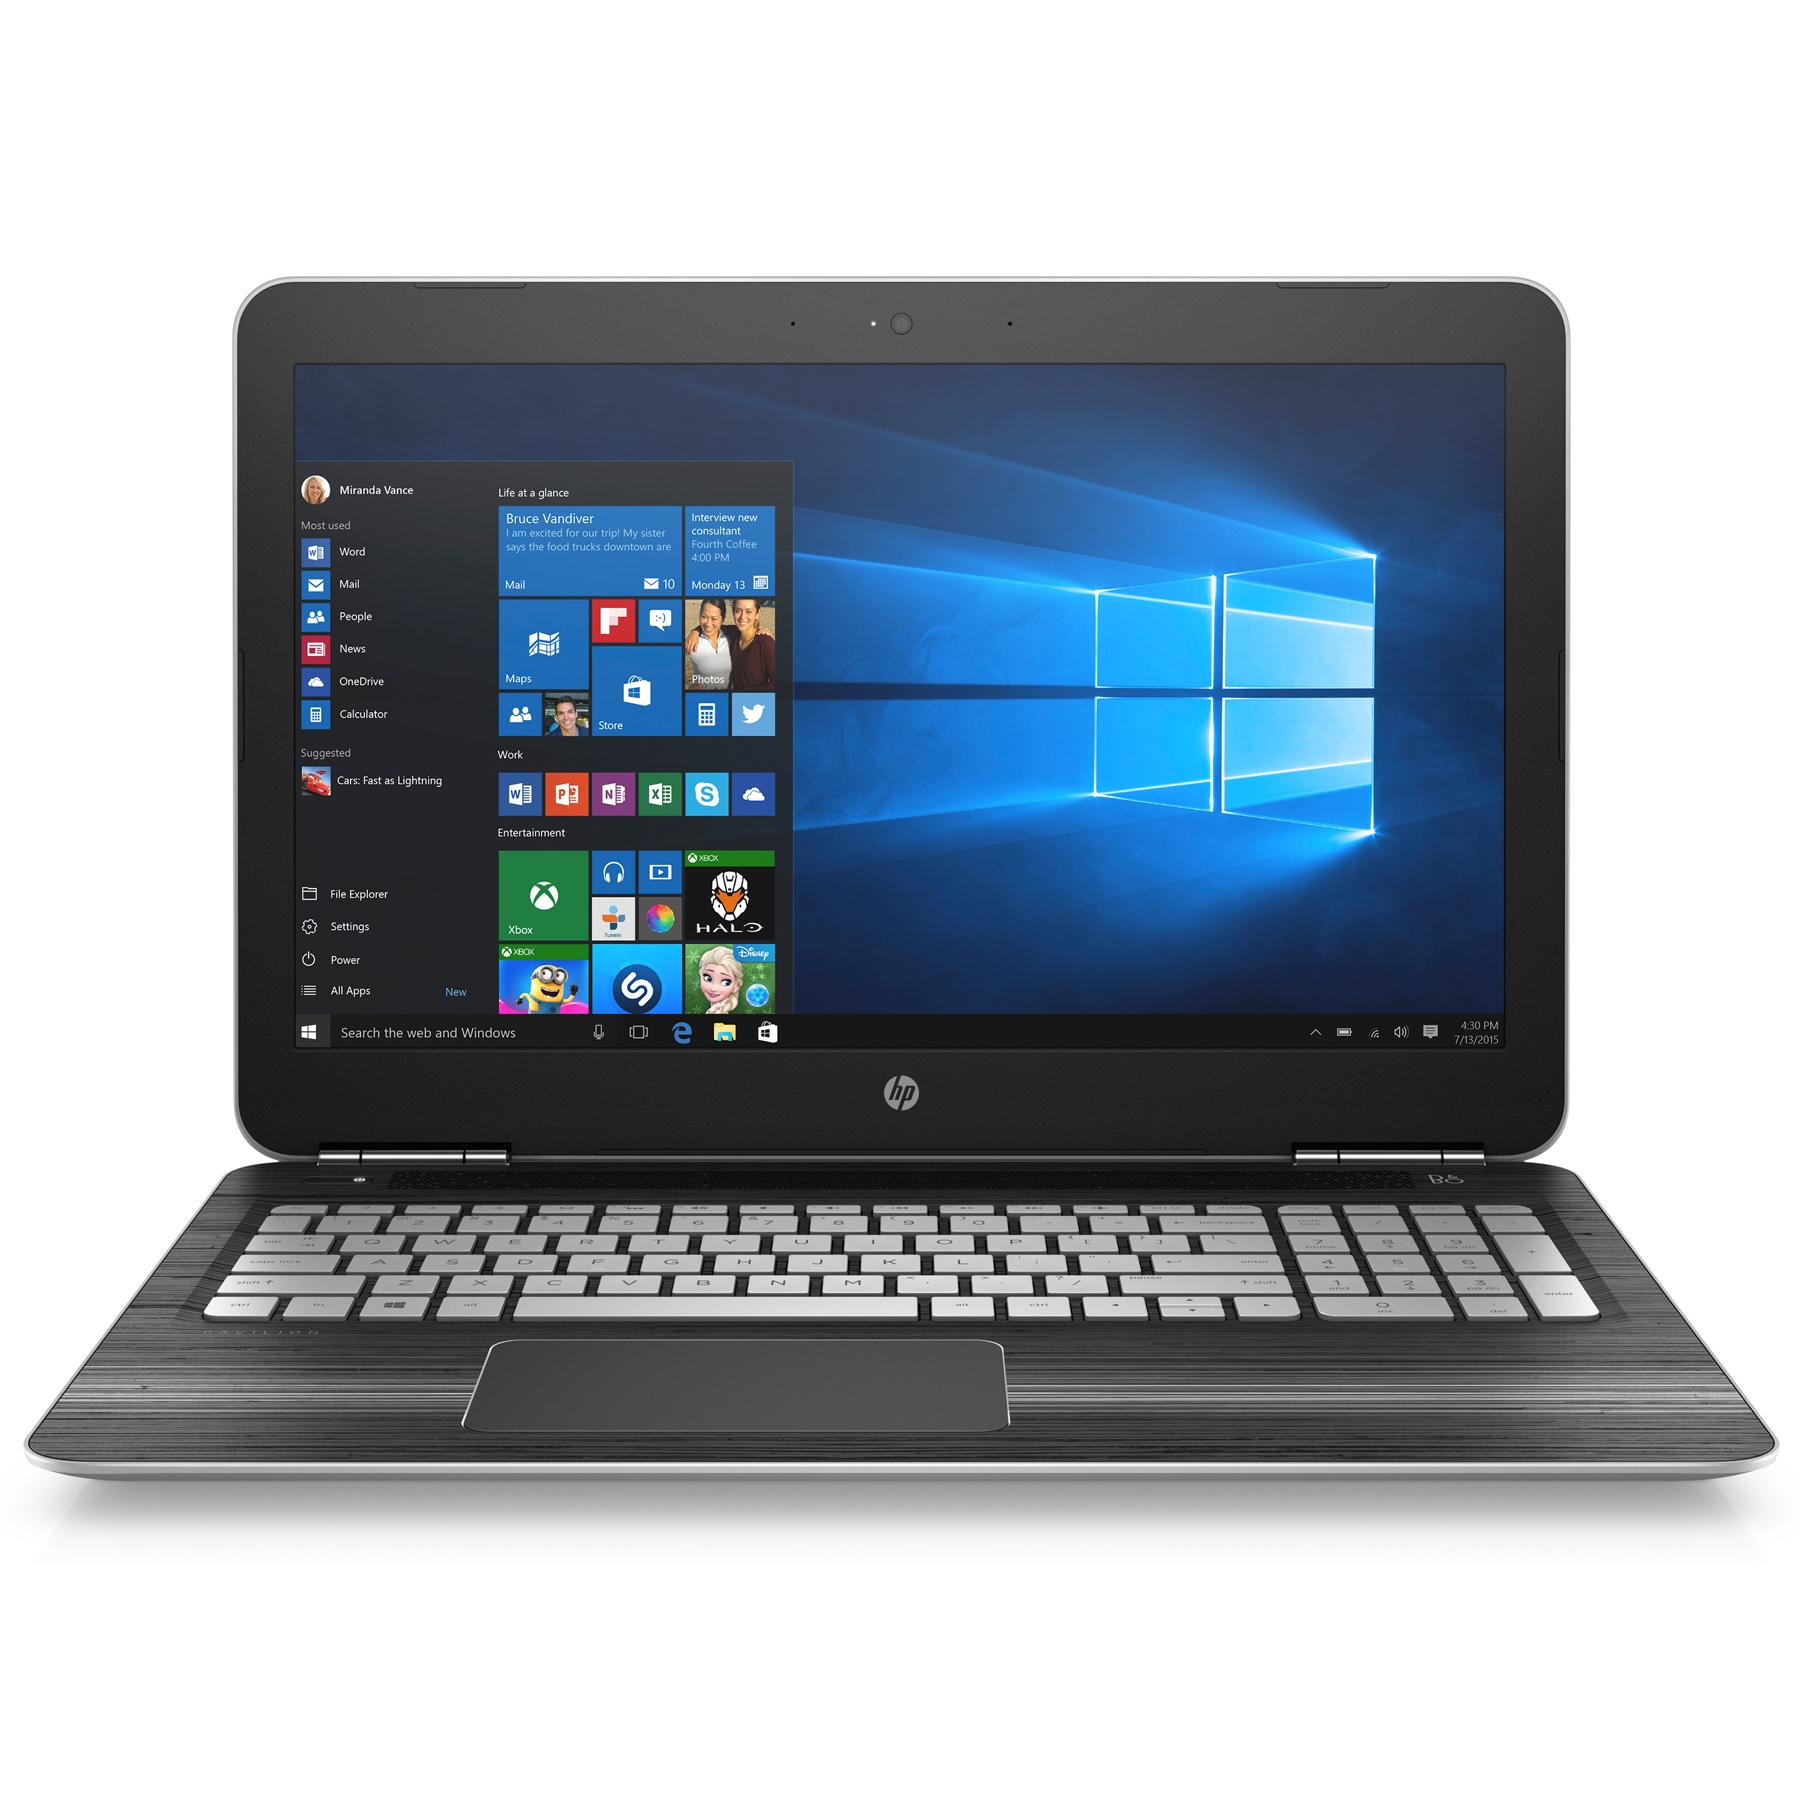 [NBB] HP Pavilion 15-bc004ng Core i5-6300HQ8GB RAM256GB SSDNVidia GeForce GTX950MWindows 10